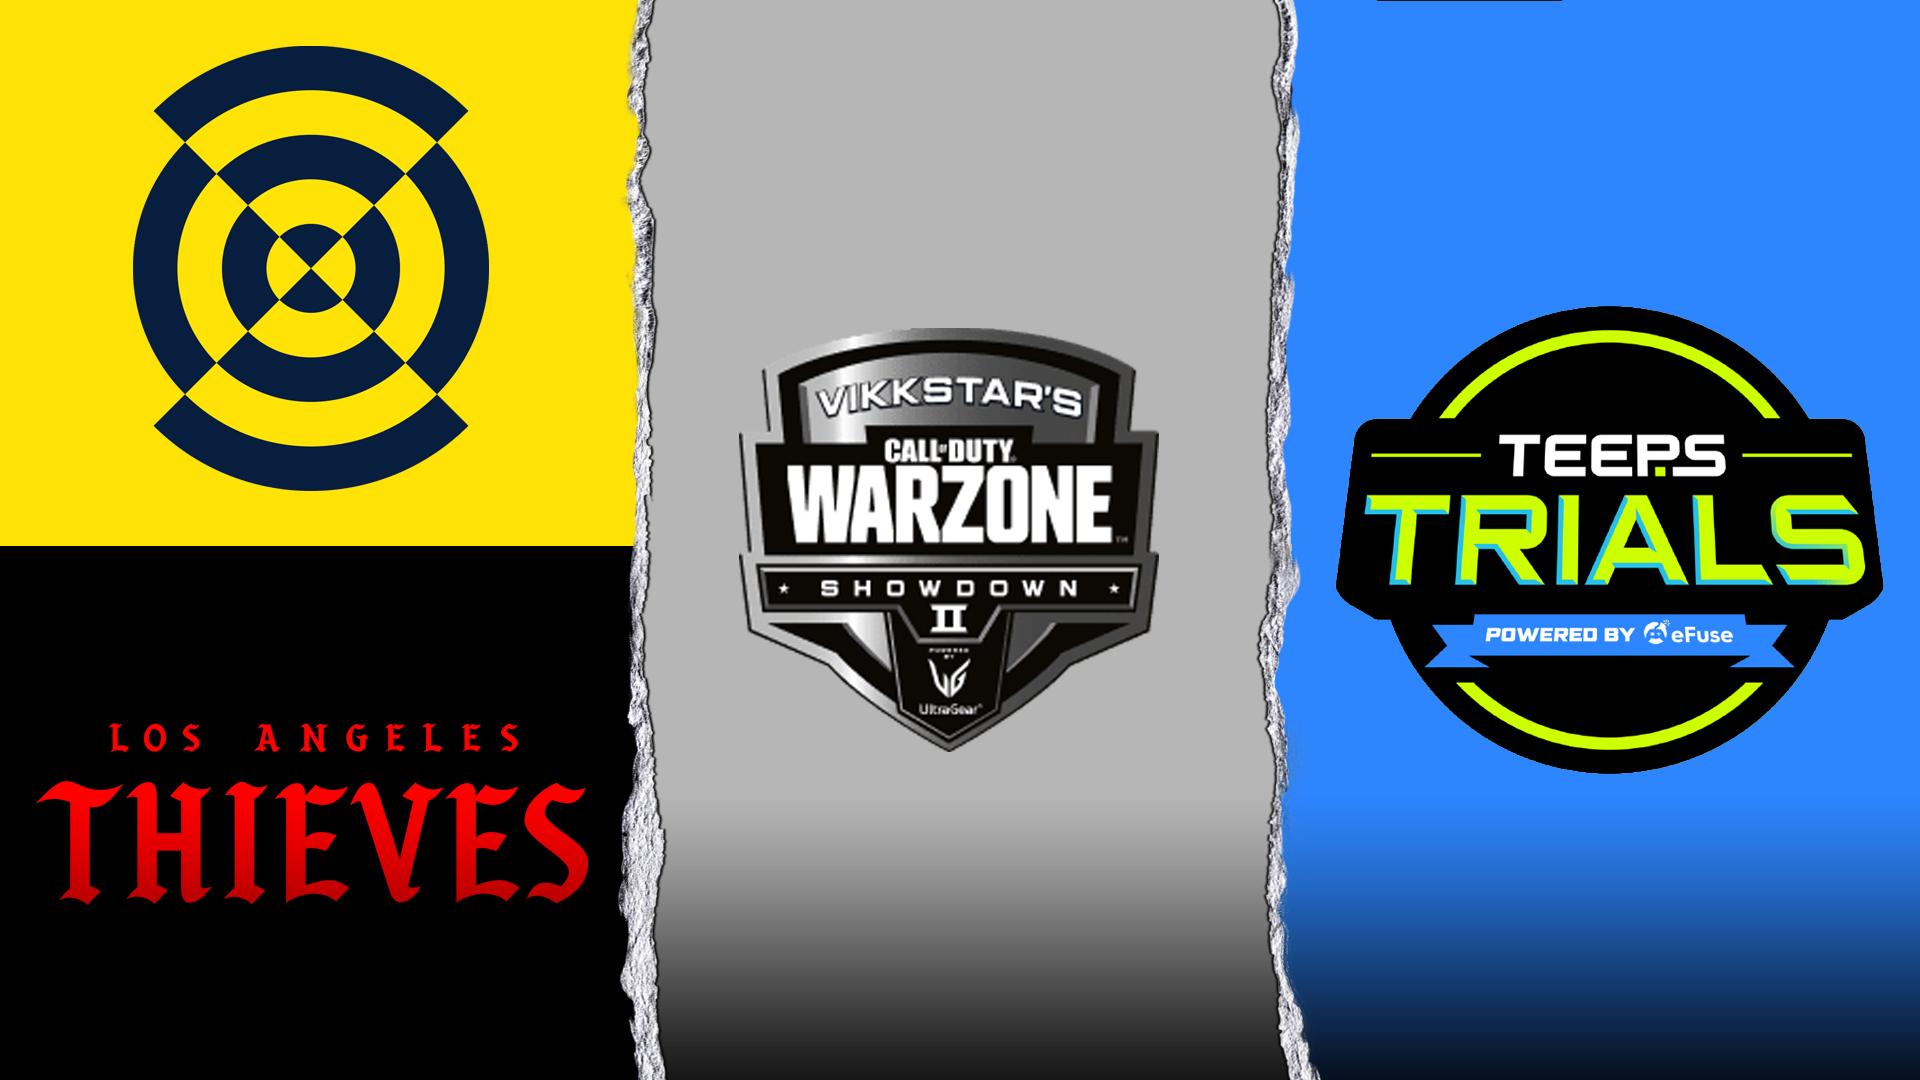 NY Warzonemania II logo, Los Angeles Thieves text, Vikkstar's COD: Warzone Showdown II logo, and TeeP's Trials logo